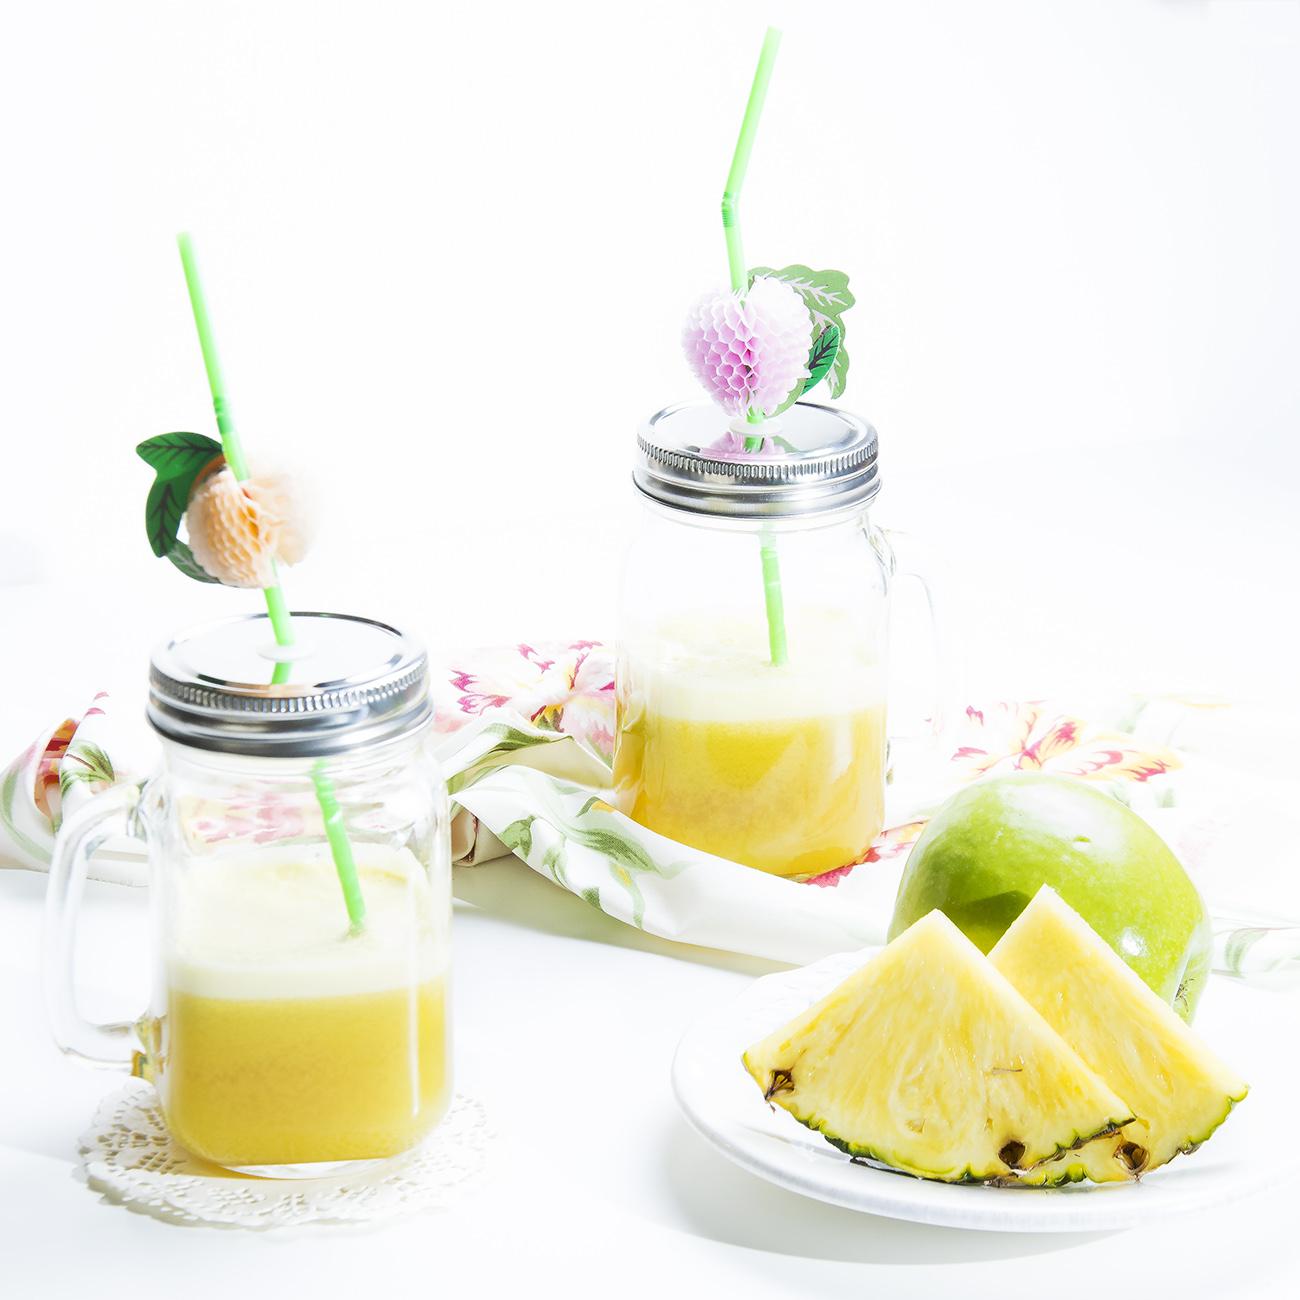 zumo piña manzana1